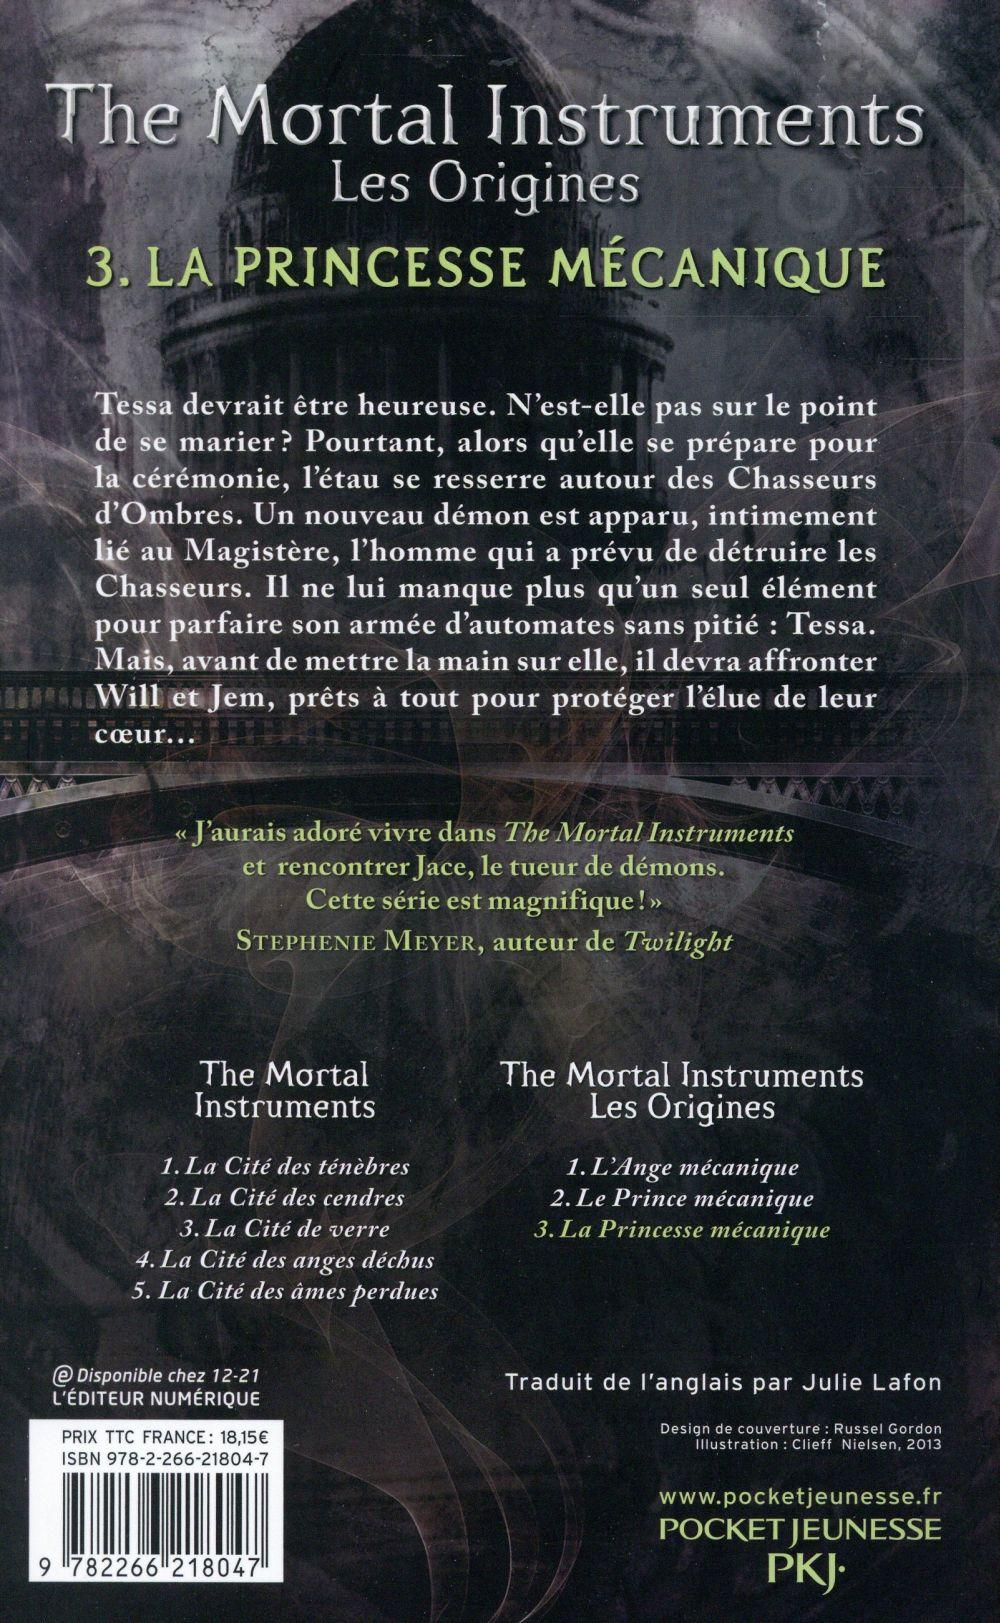 The Mortal Instruments Les Origines : mortal, instruments, origines, Mortal, Instruments, Origines, Princesse, Mécanique, Cassandra, Clare, Pocket, Jeunesse, Grand, Format, Livre, NANCY